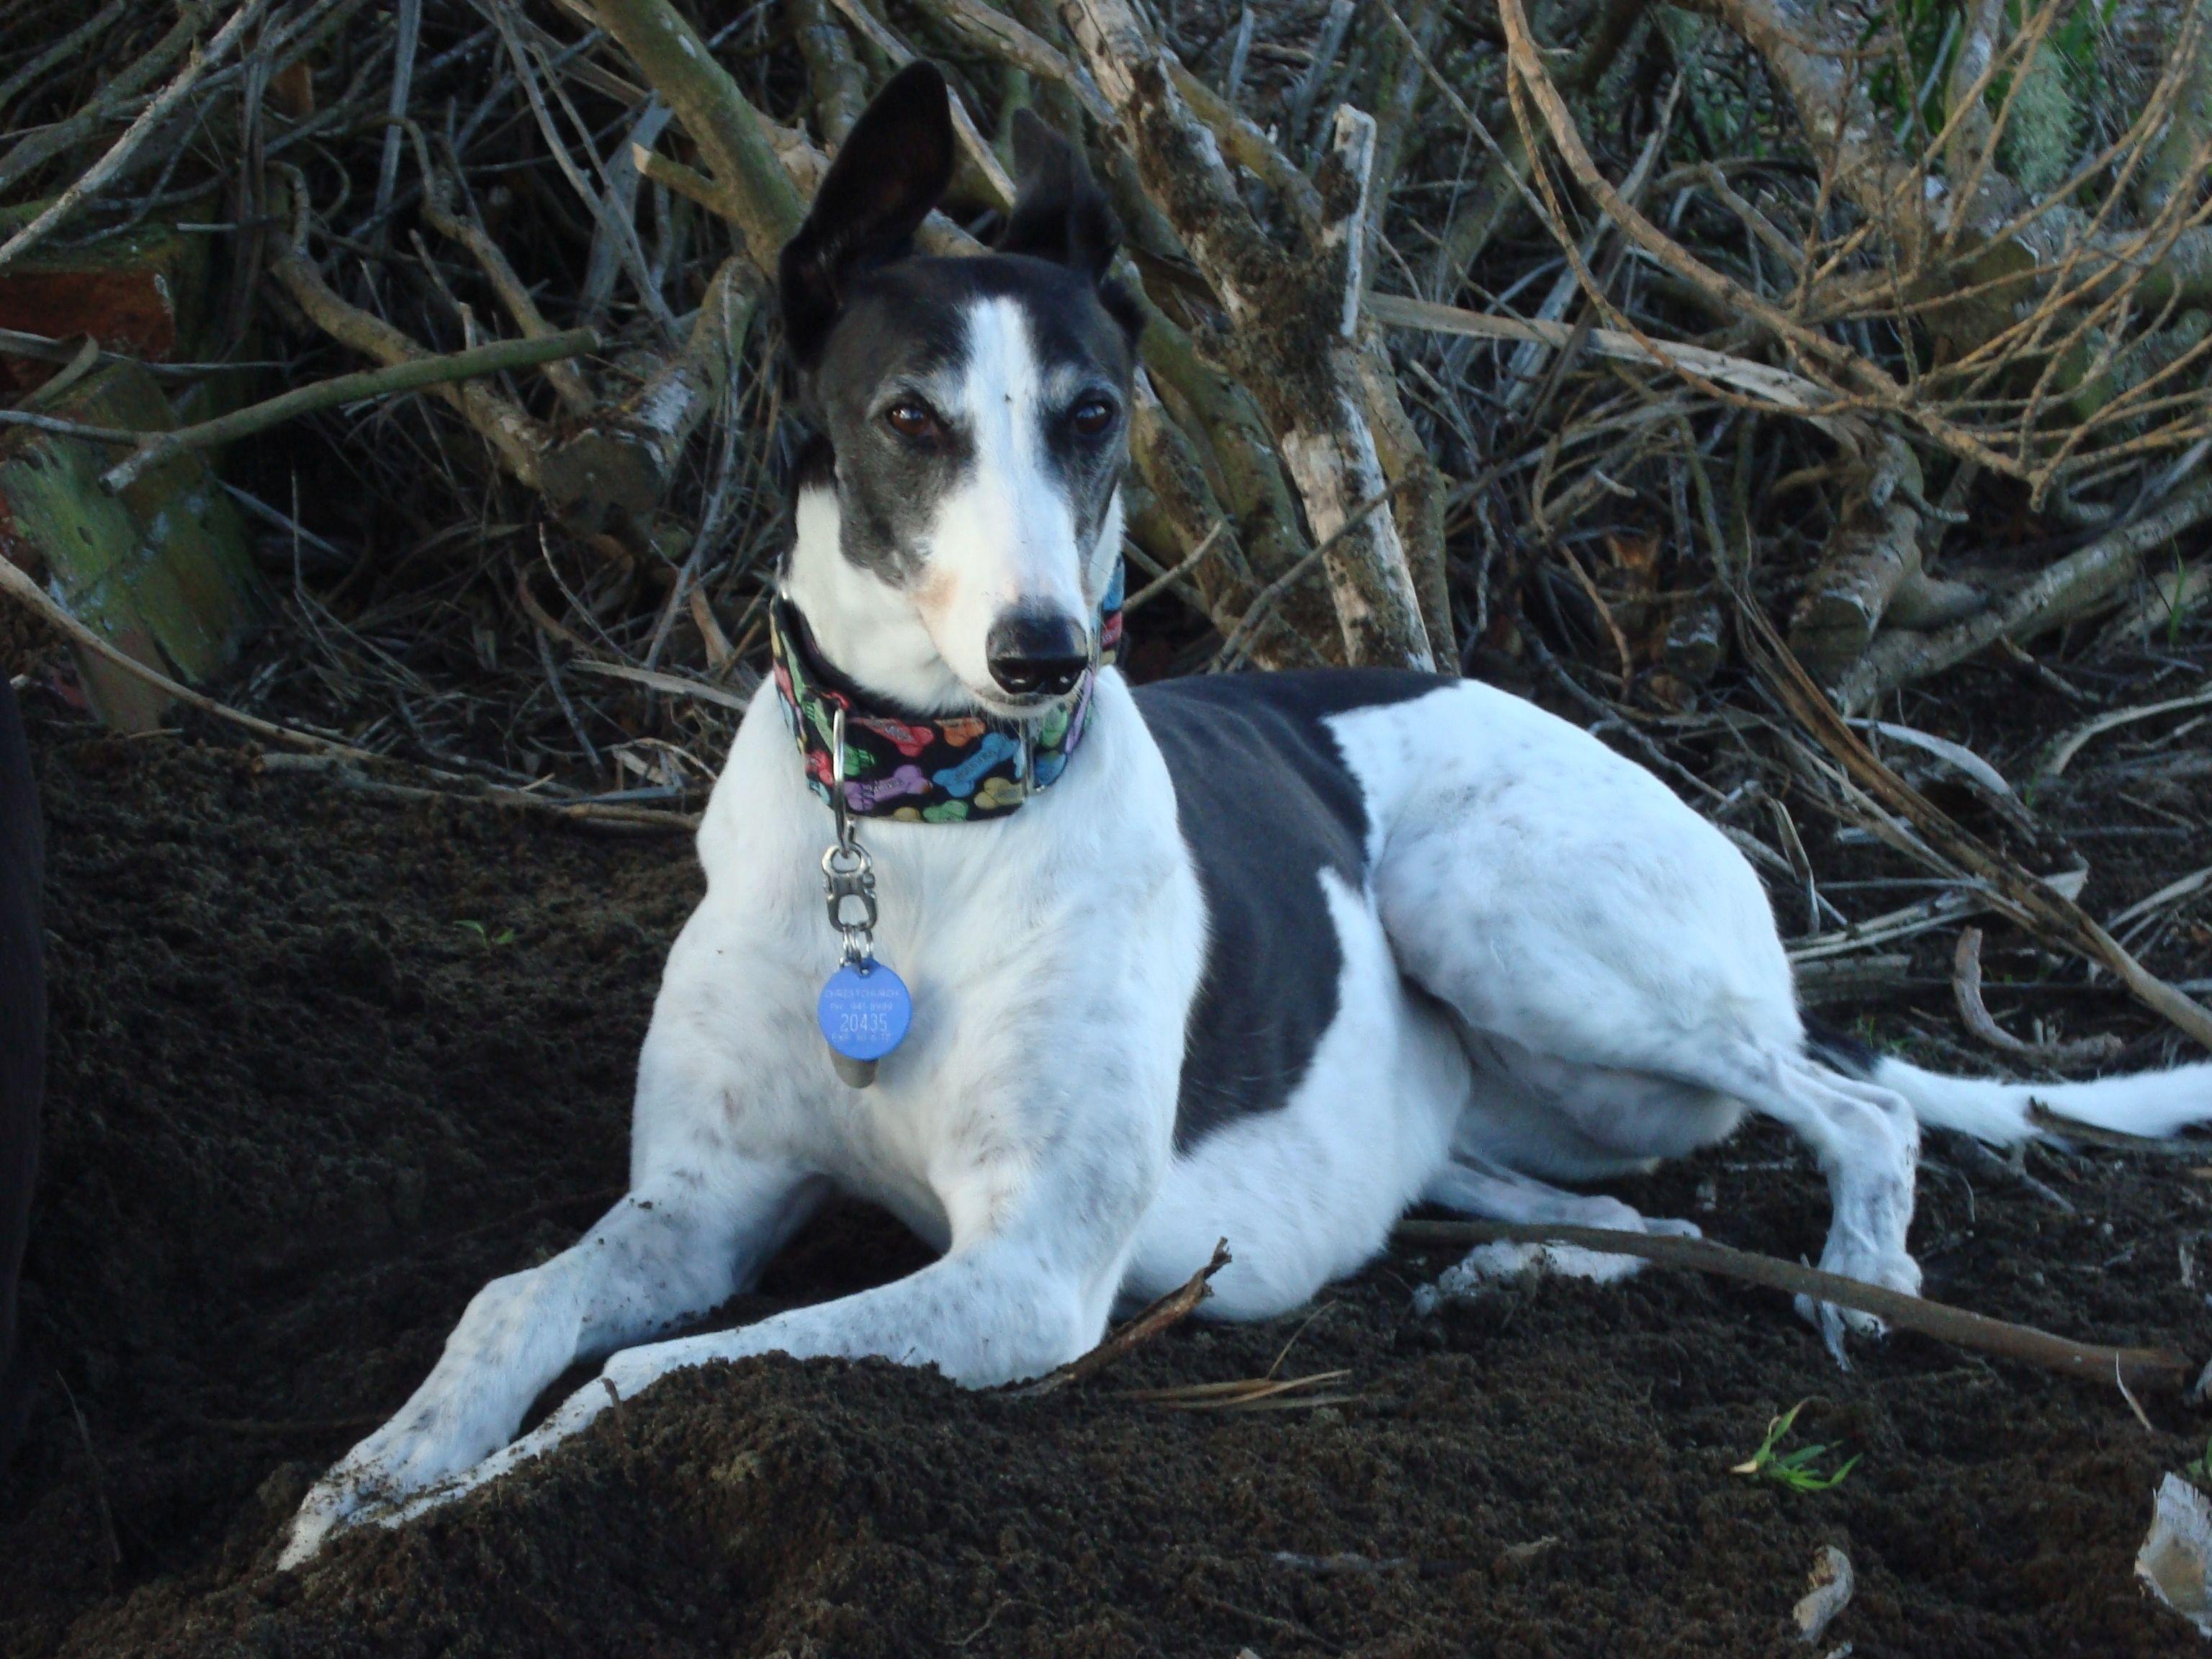 Izzy of The Balanced Dog